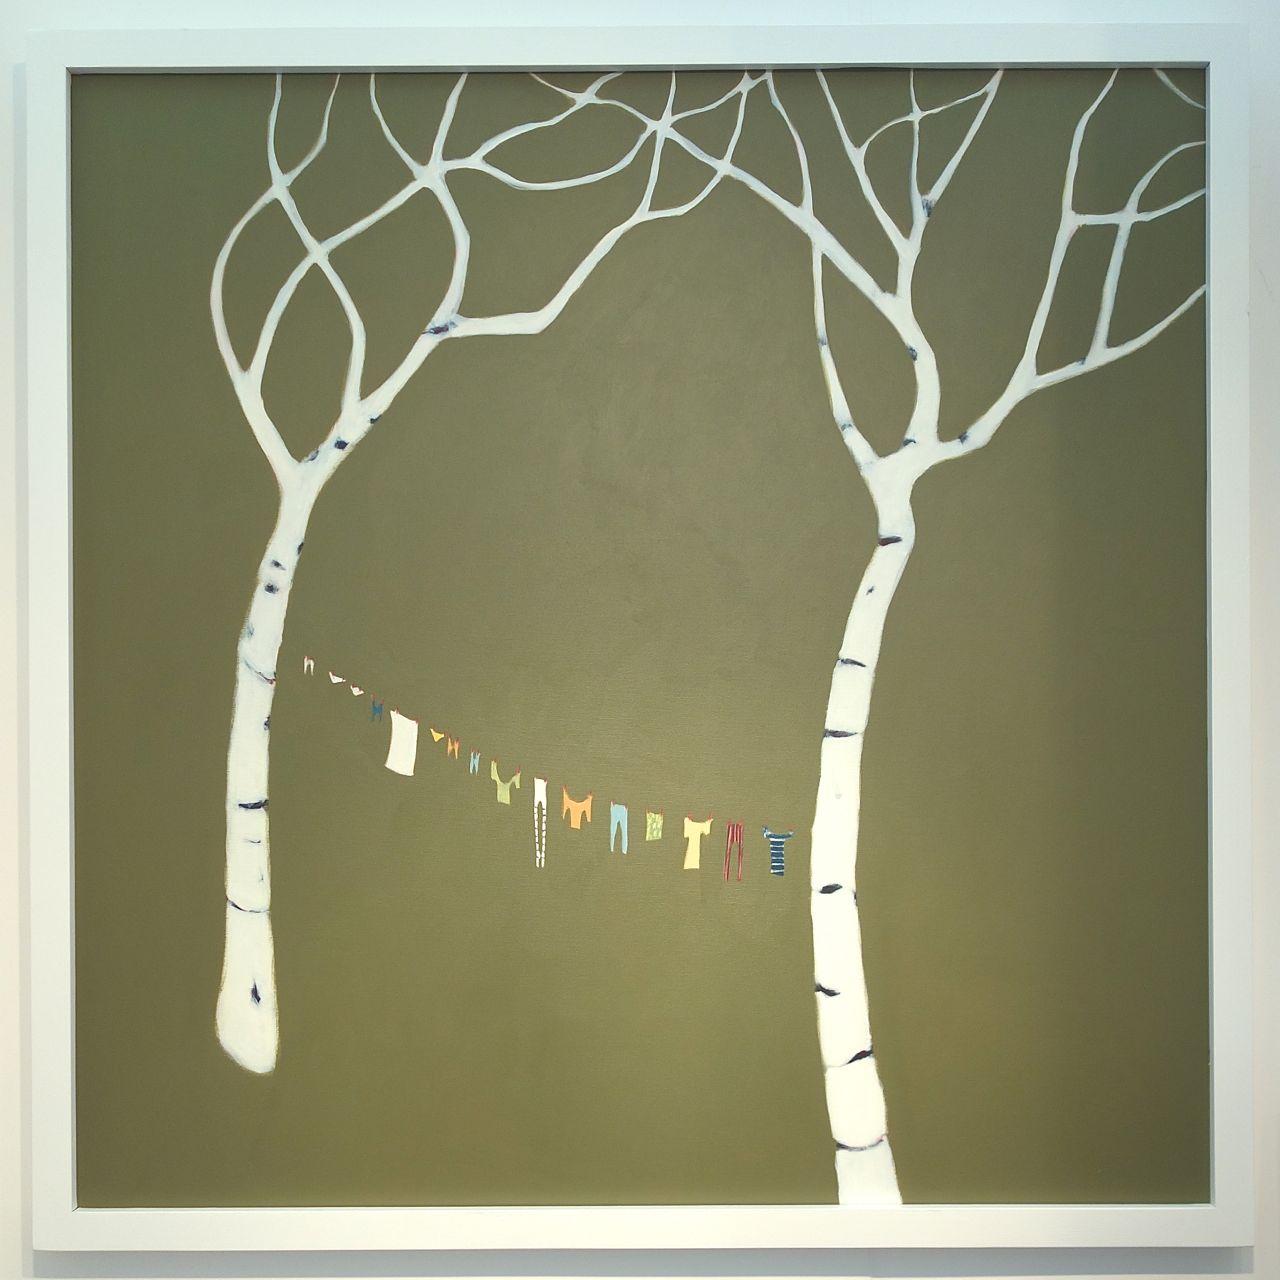 Beth Richardson, 'Birches', 2016, Acrylic on canvas, 128 x 128 cm. GreenStage Gallery (Worcester)